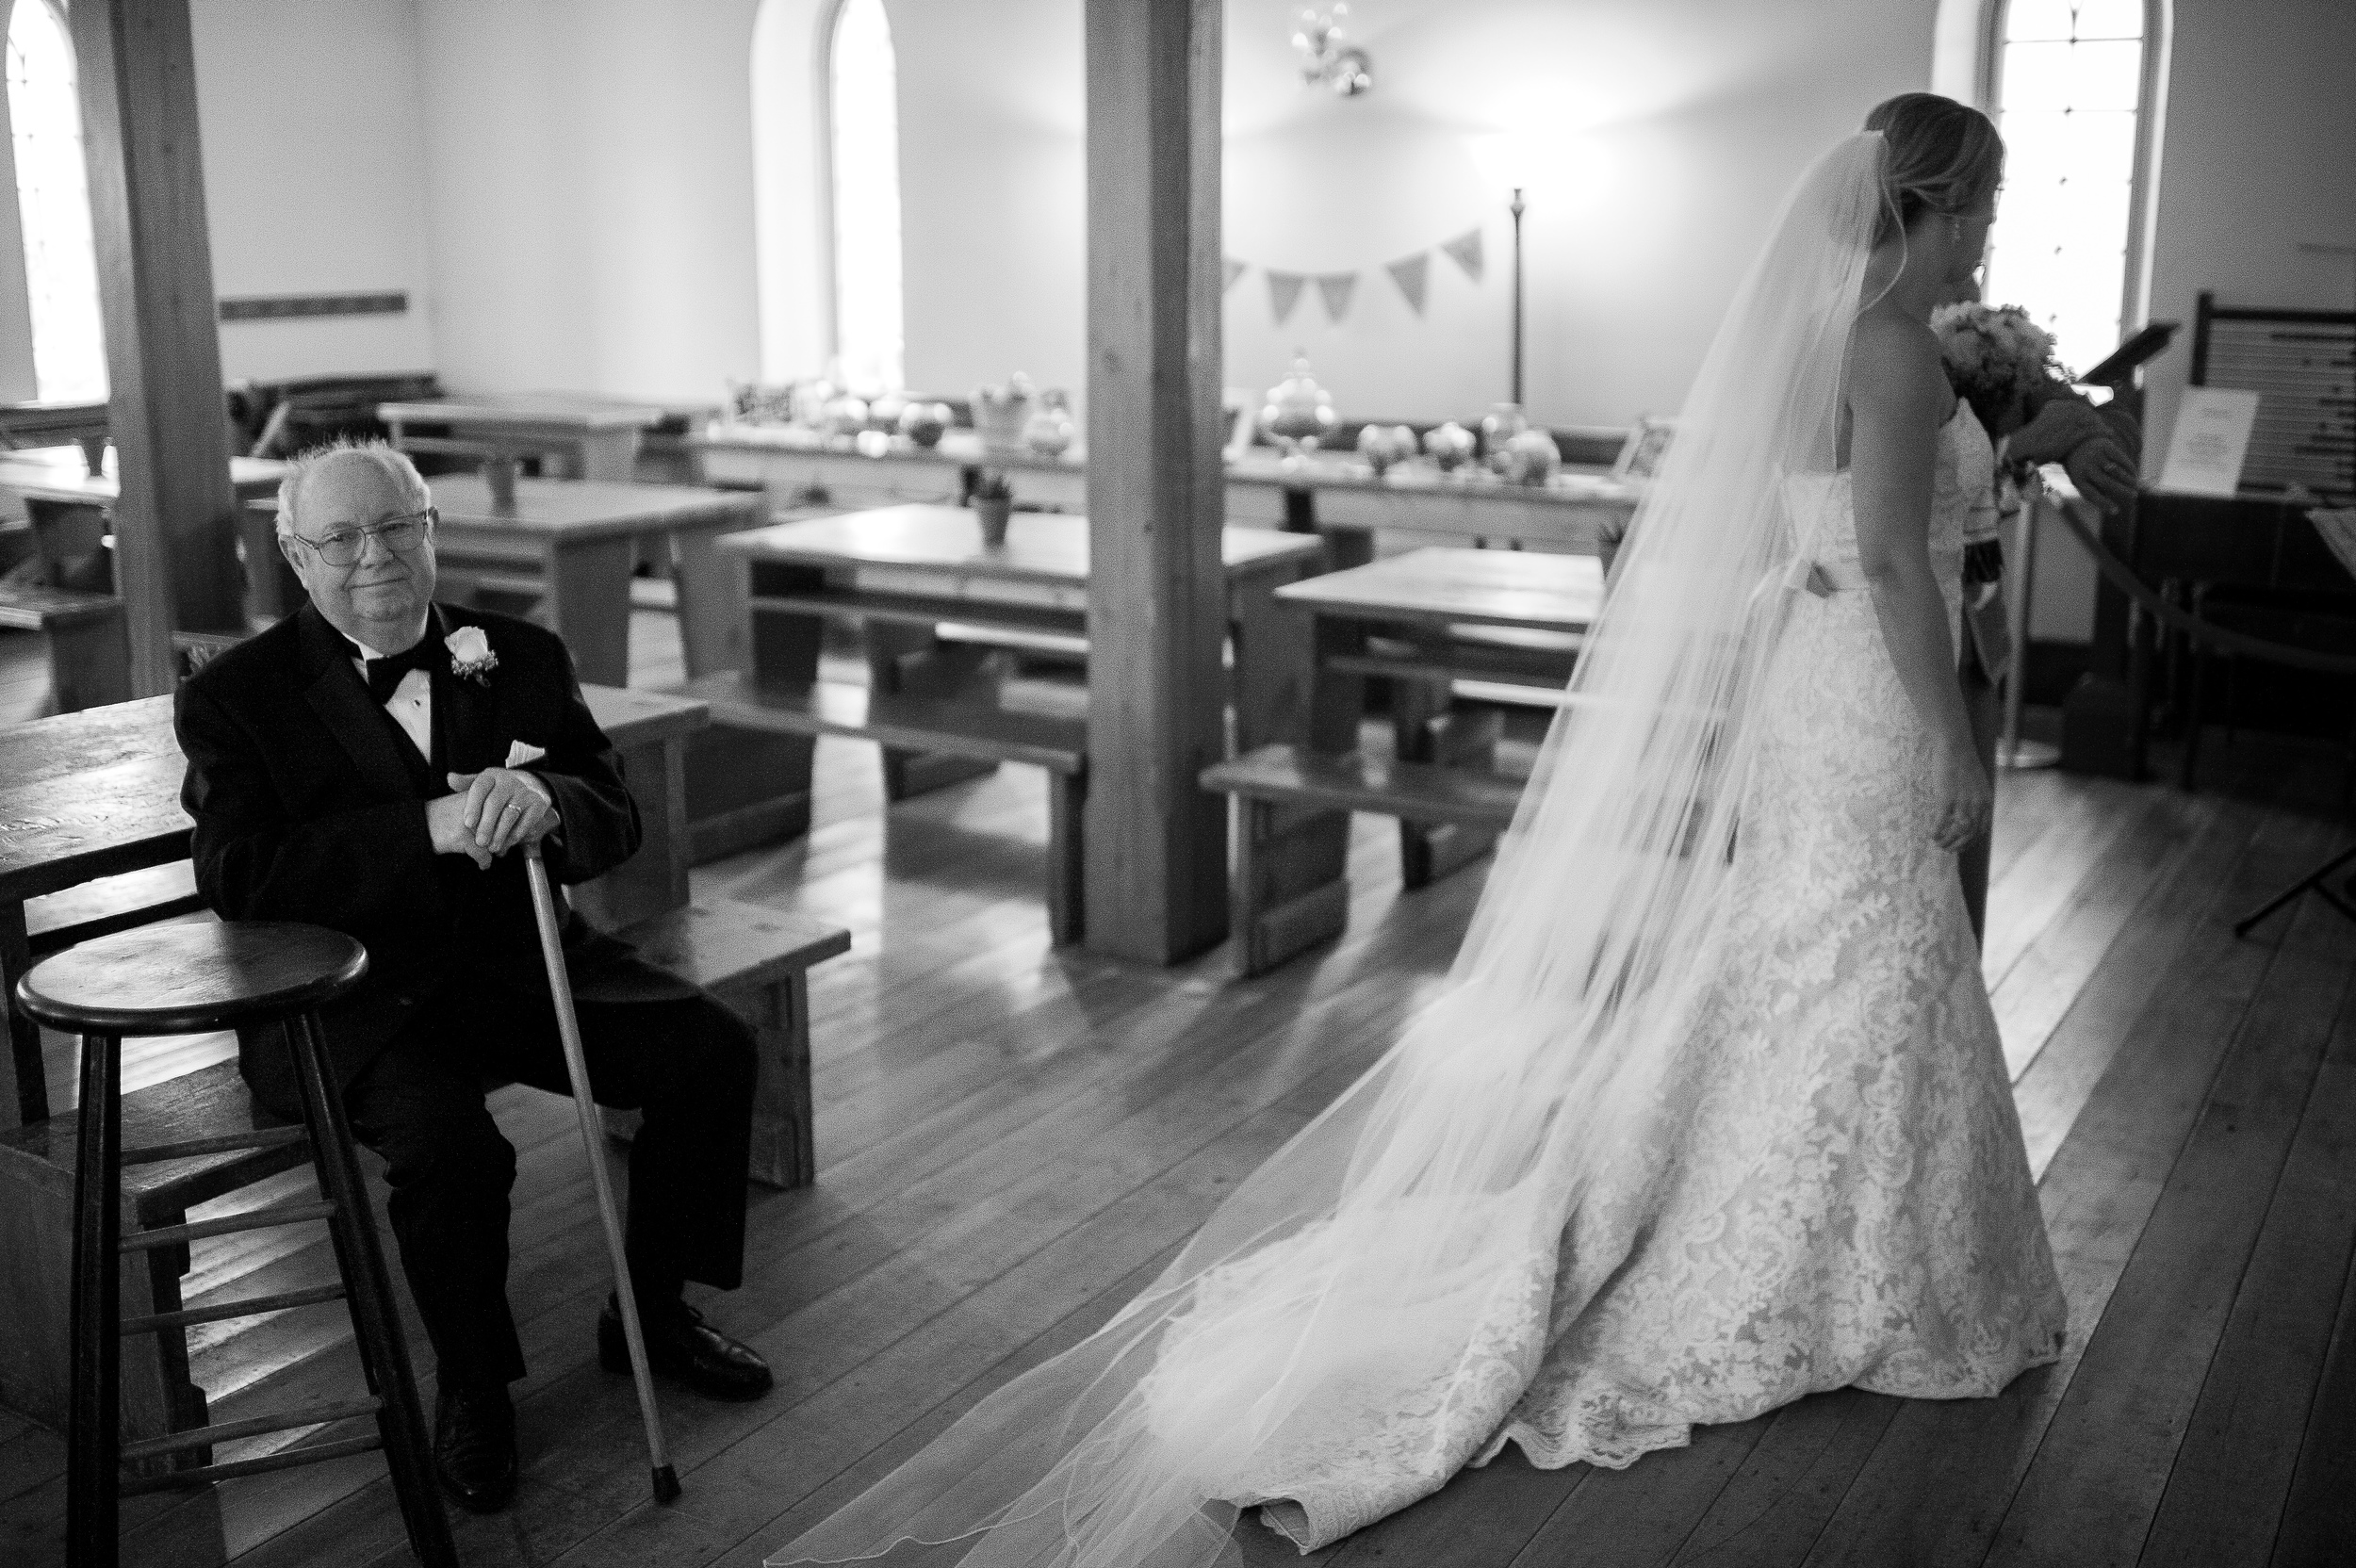 enoch-turner-wedding-photograph-003.jpg